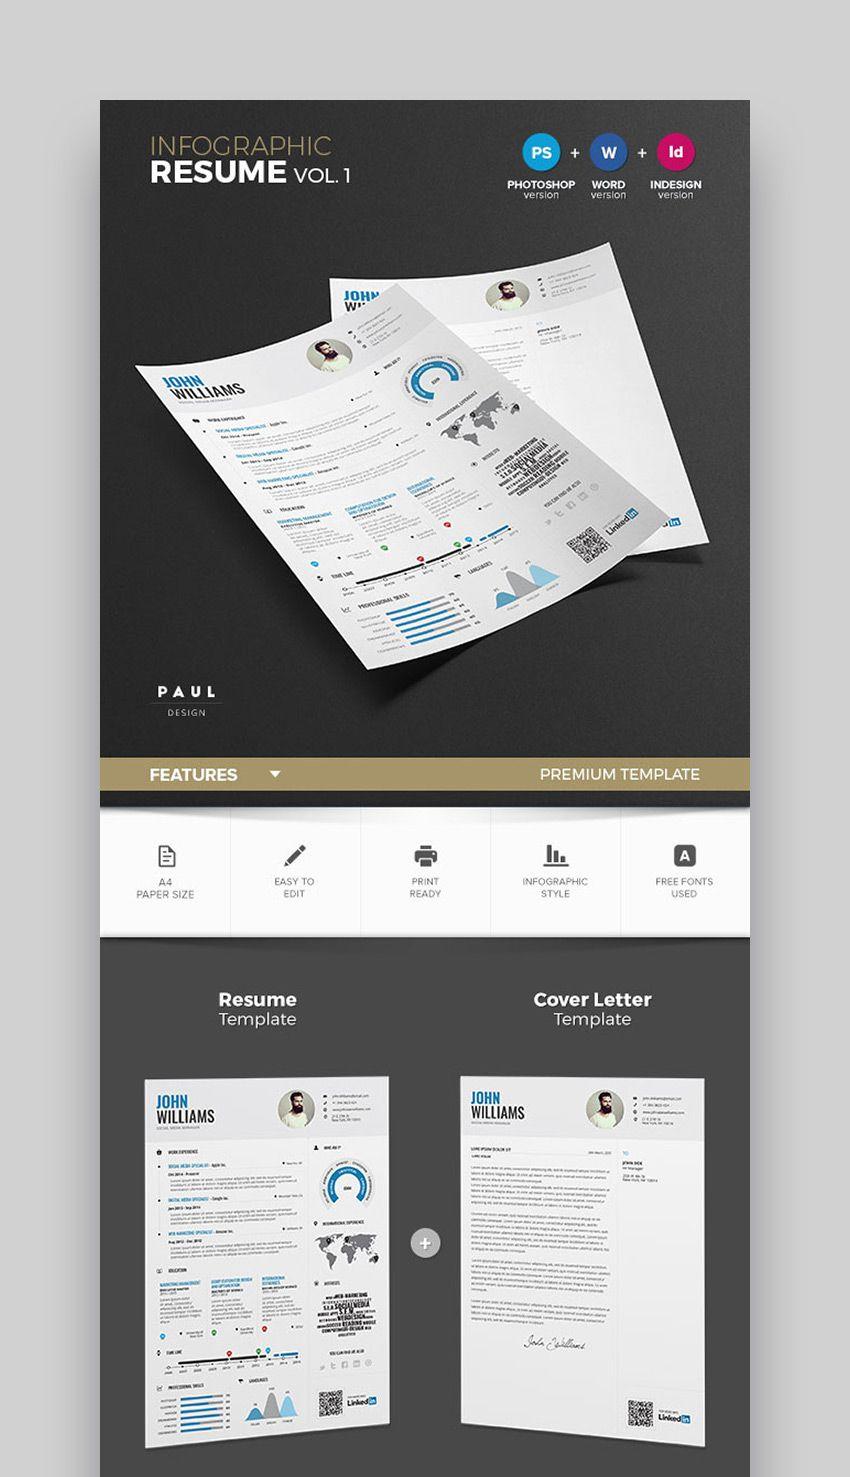 Infographic Resume Vol 1 Infographic Resume Infographic Resume Template Infographic